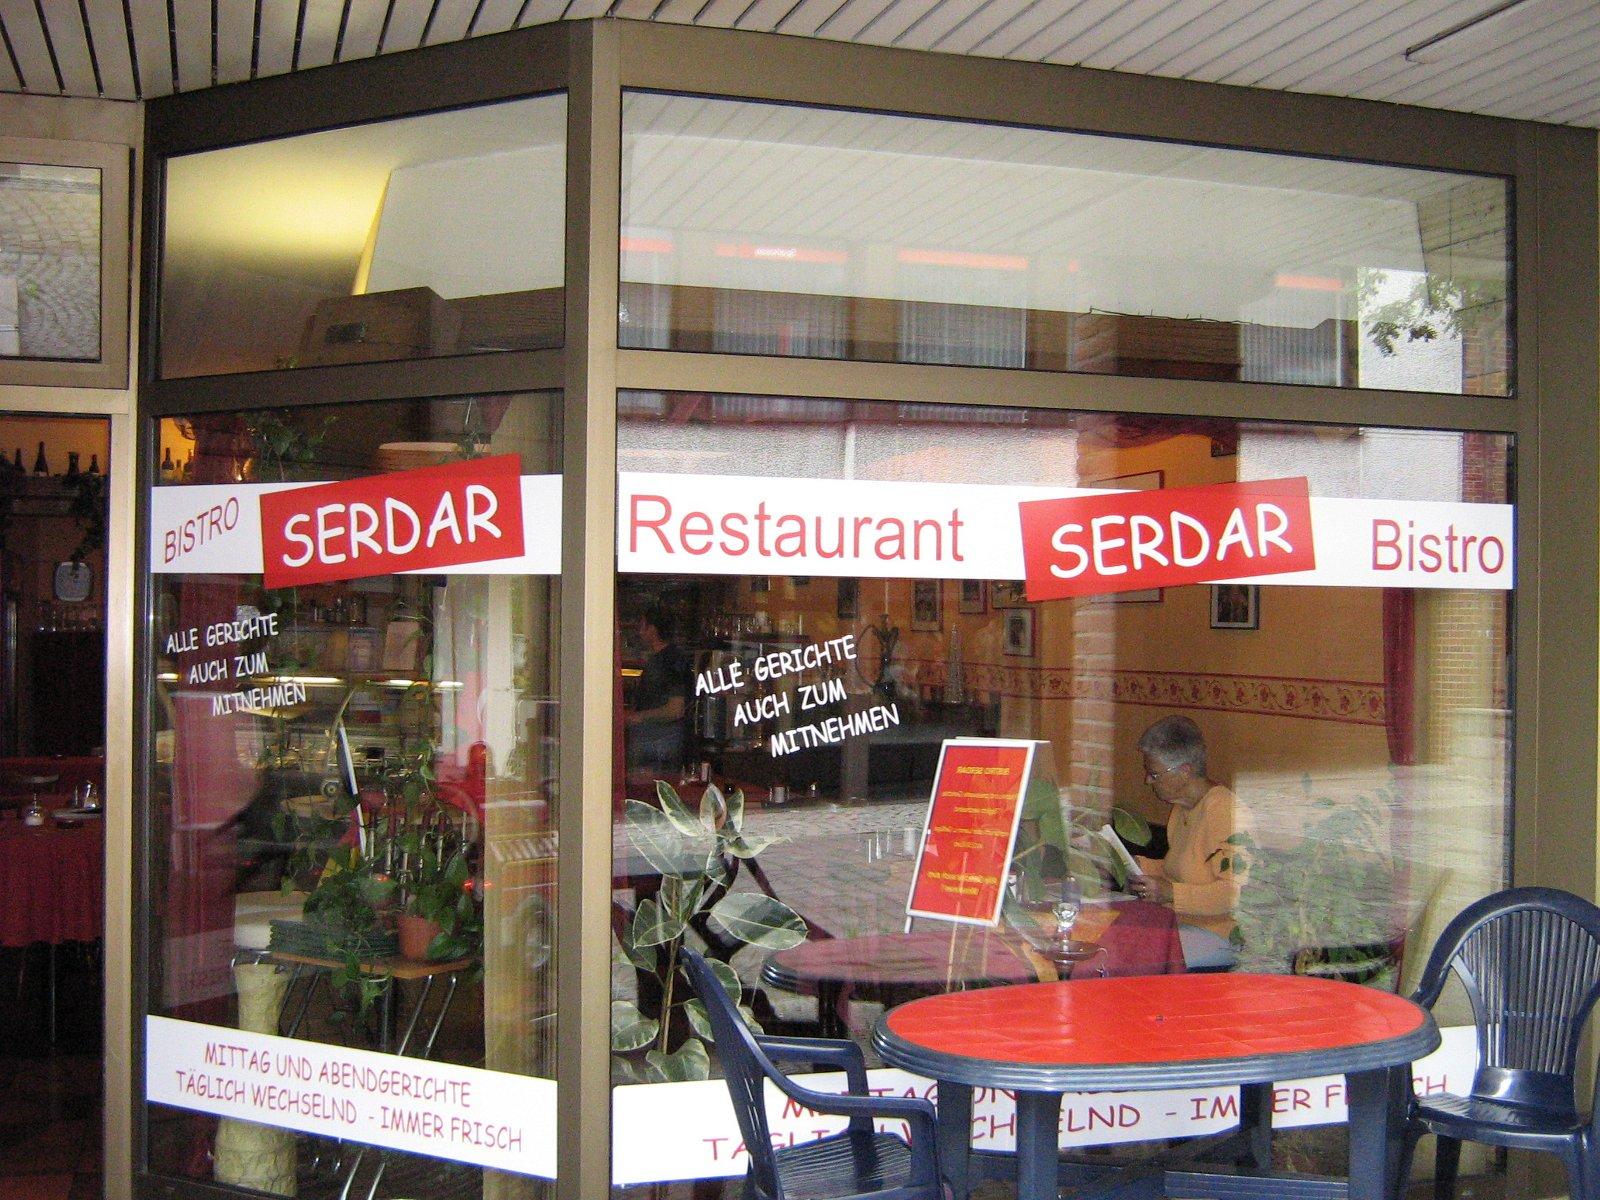 Kulturbistro Serdar